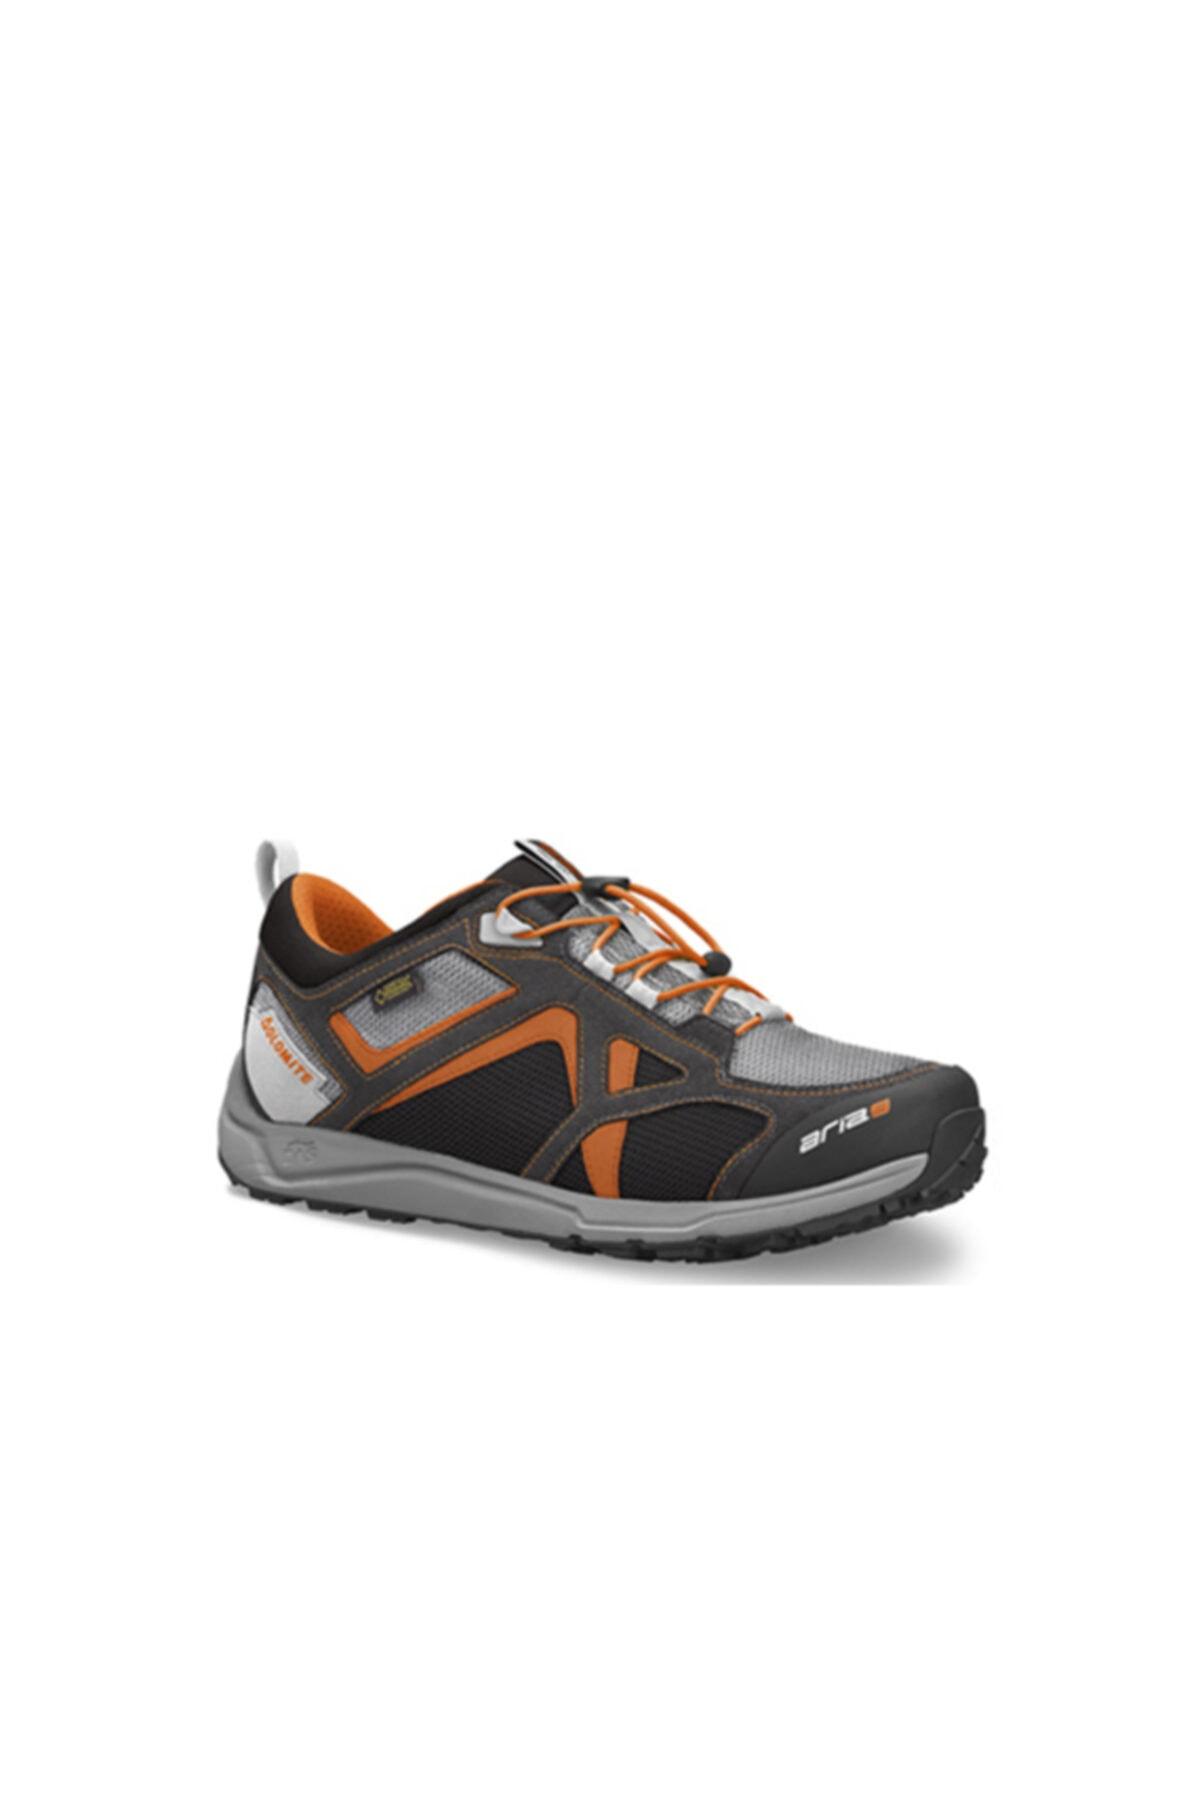 Dolomite Aria S Gtx Trekking Erkek Ayakkabı Lacivert-gri - 46 2